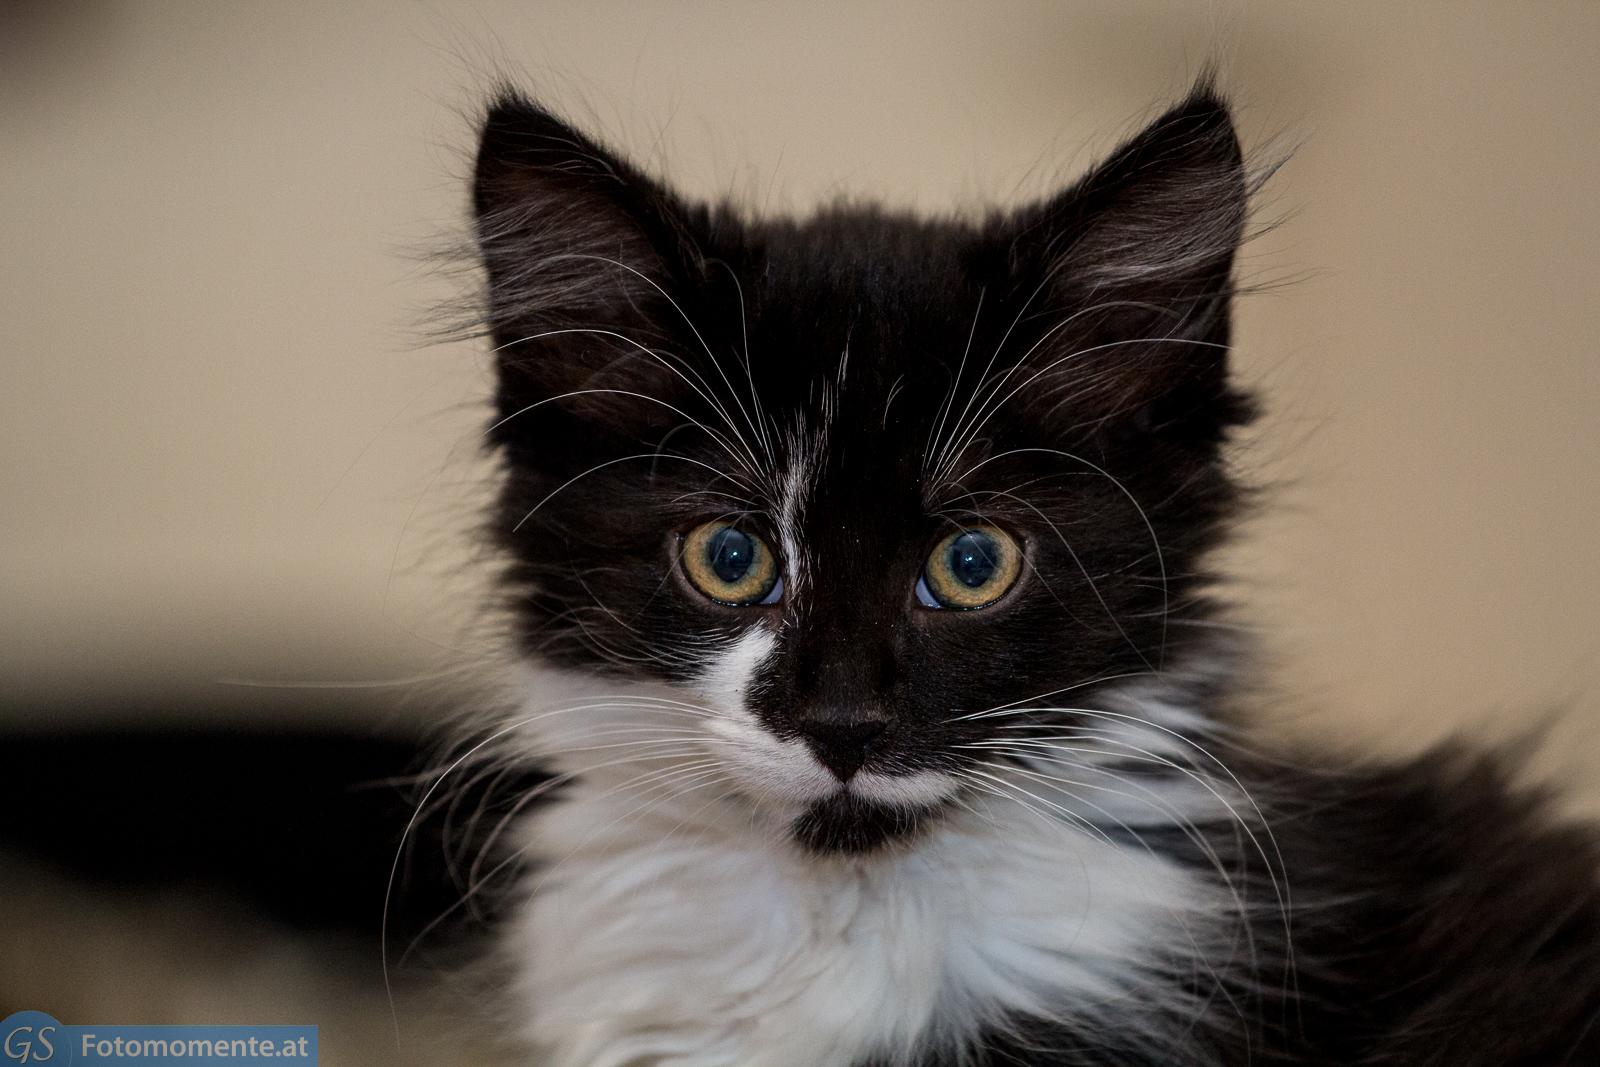 28 Katzen Bounty großaufnahme - Katze Bounty und Kater Leo 10 - 12 Wochen alt - Teil 1